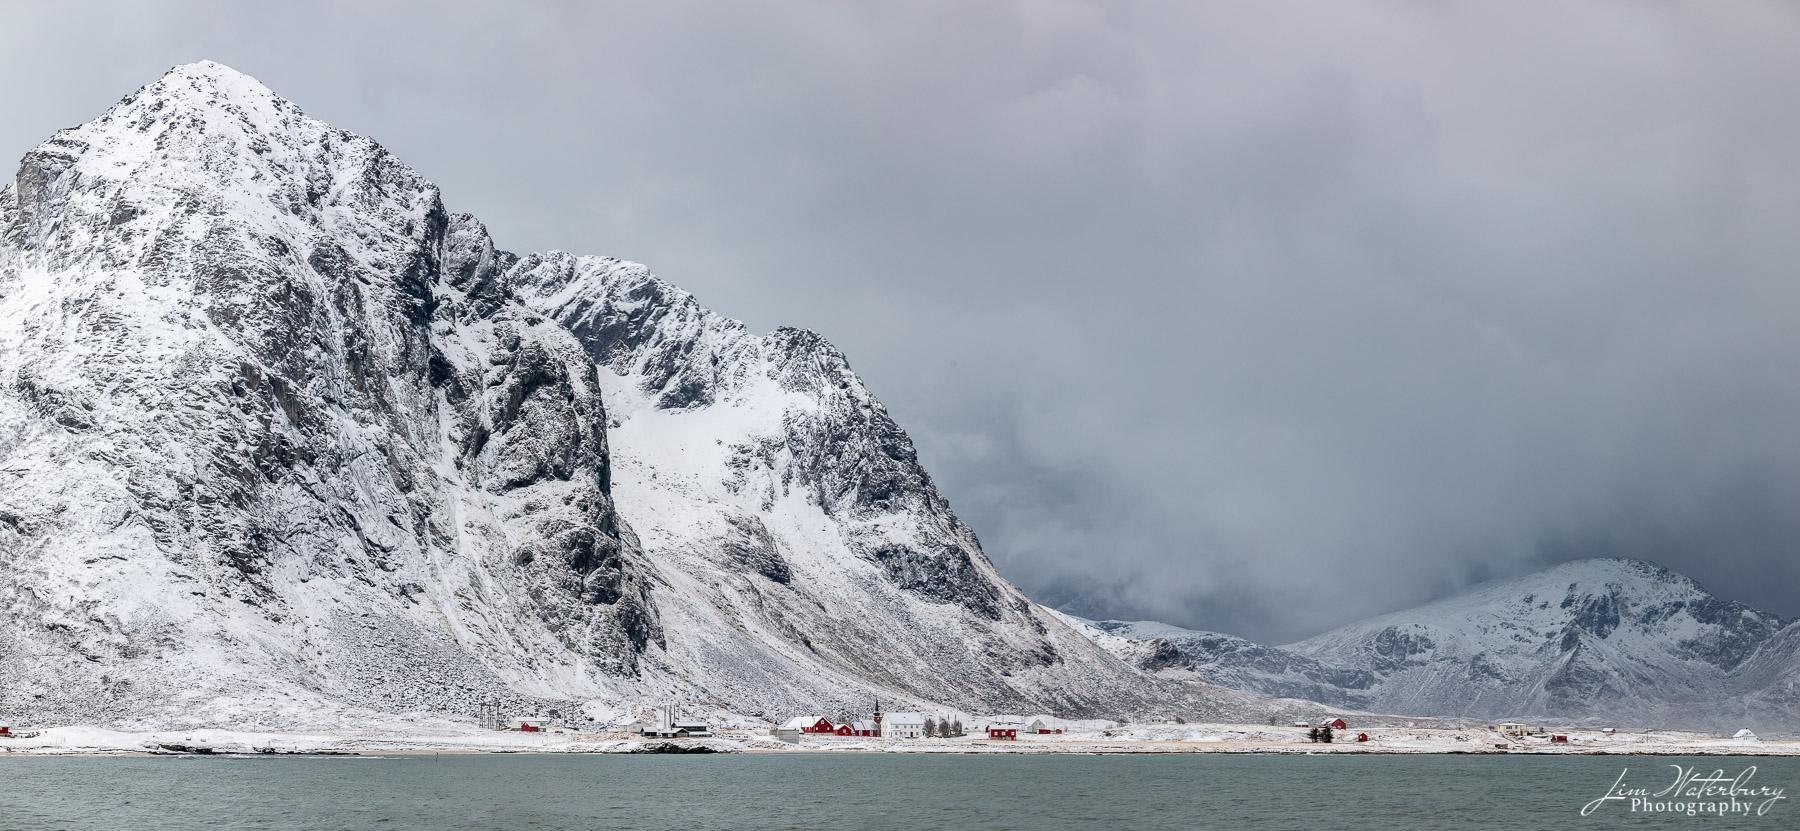 Flakstad, Lofoten, Norway, village, mountains, fjord, winter, photo